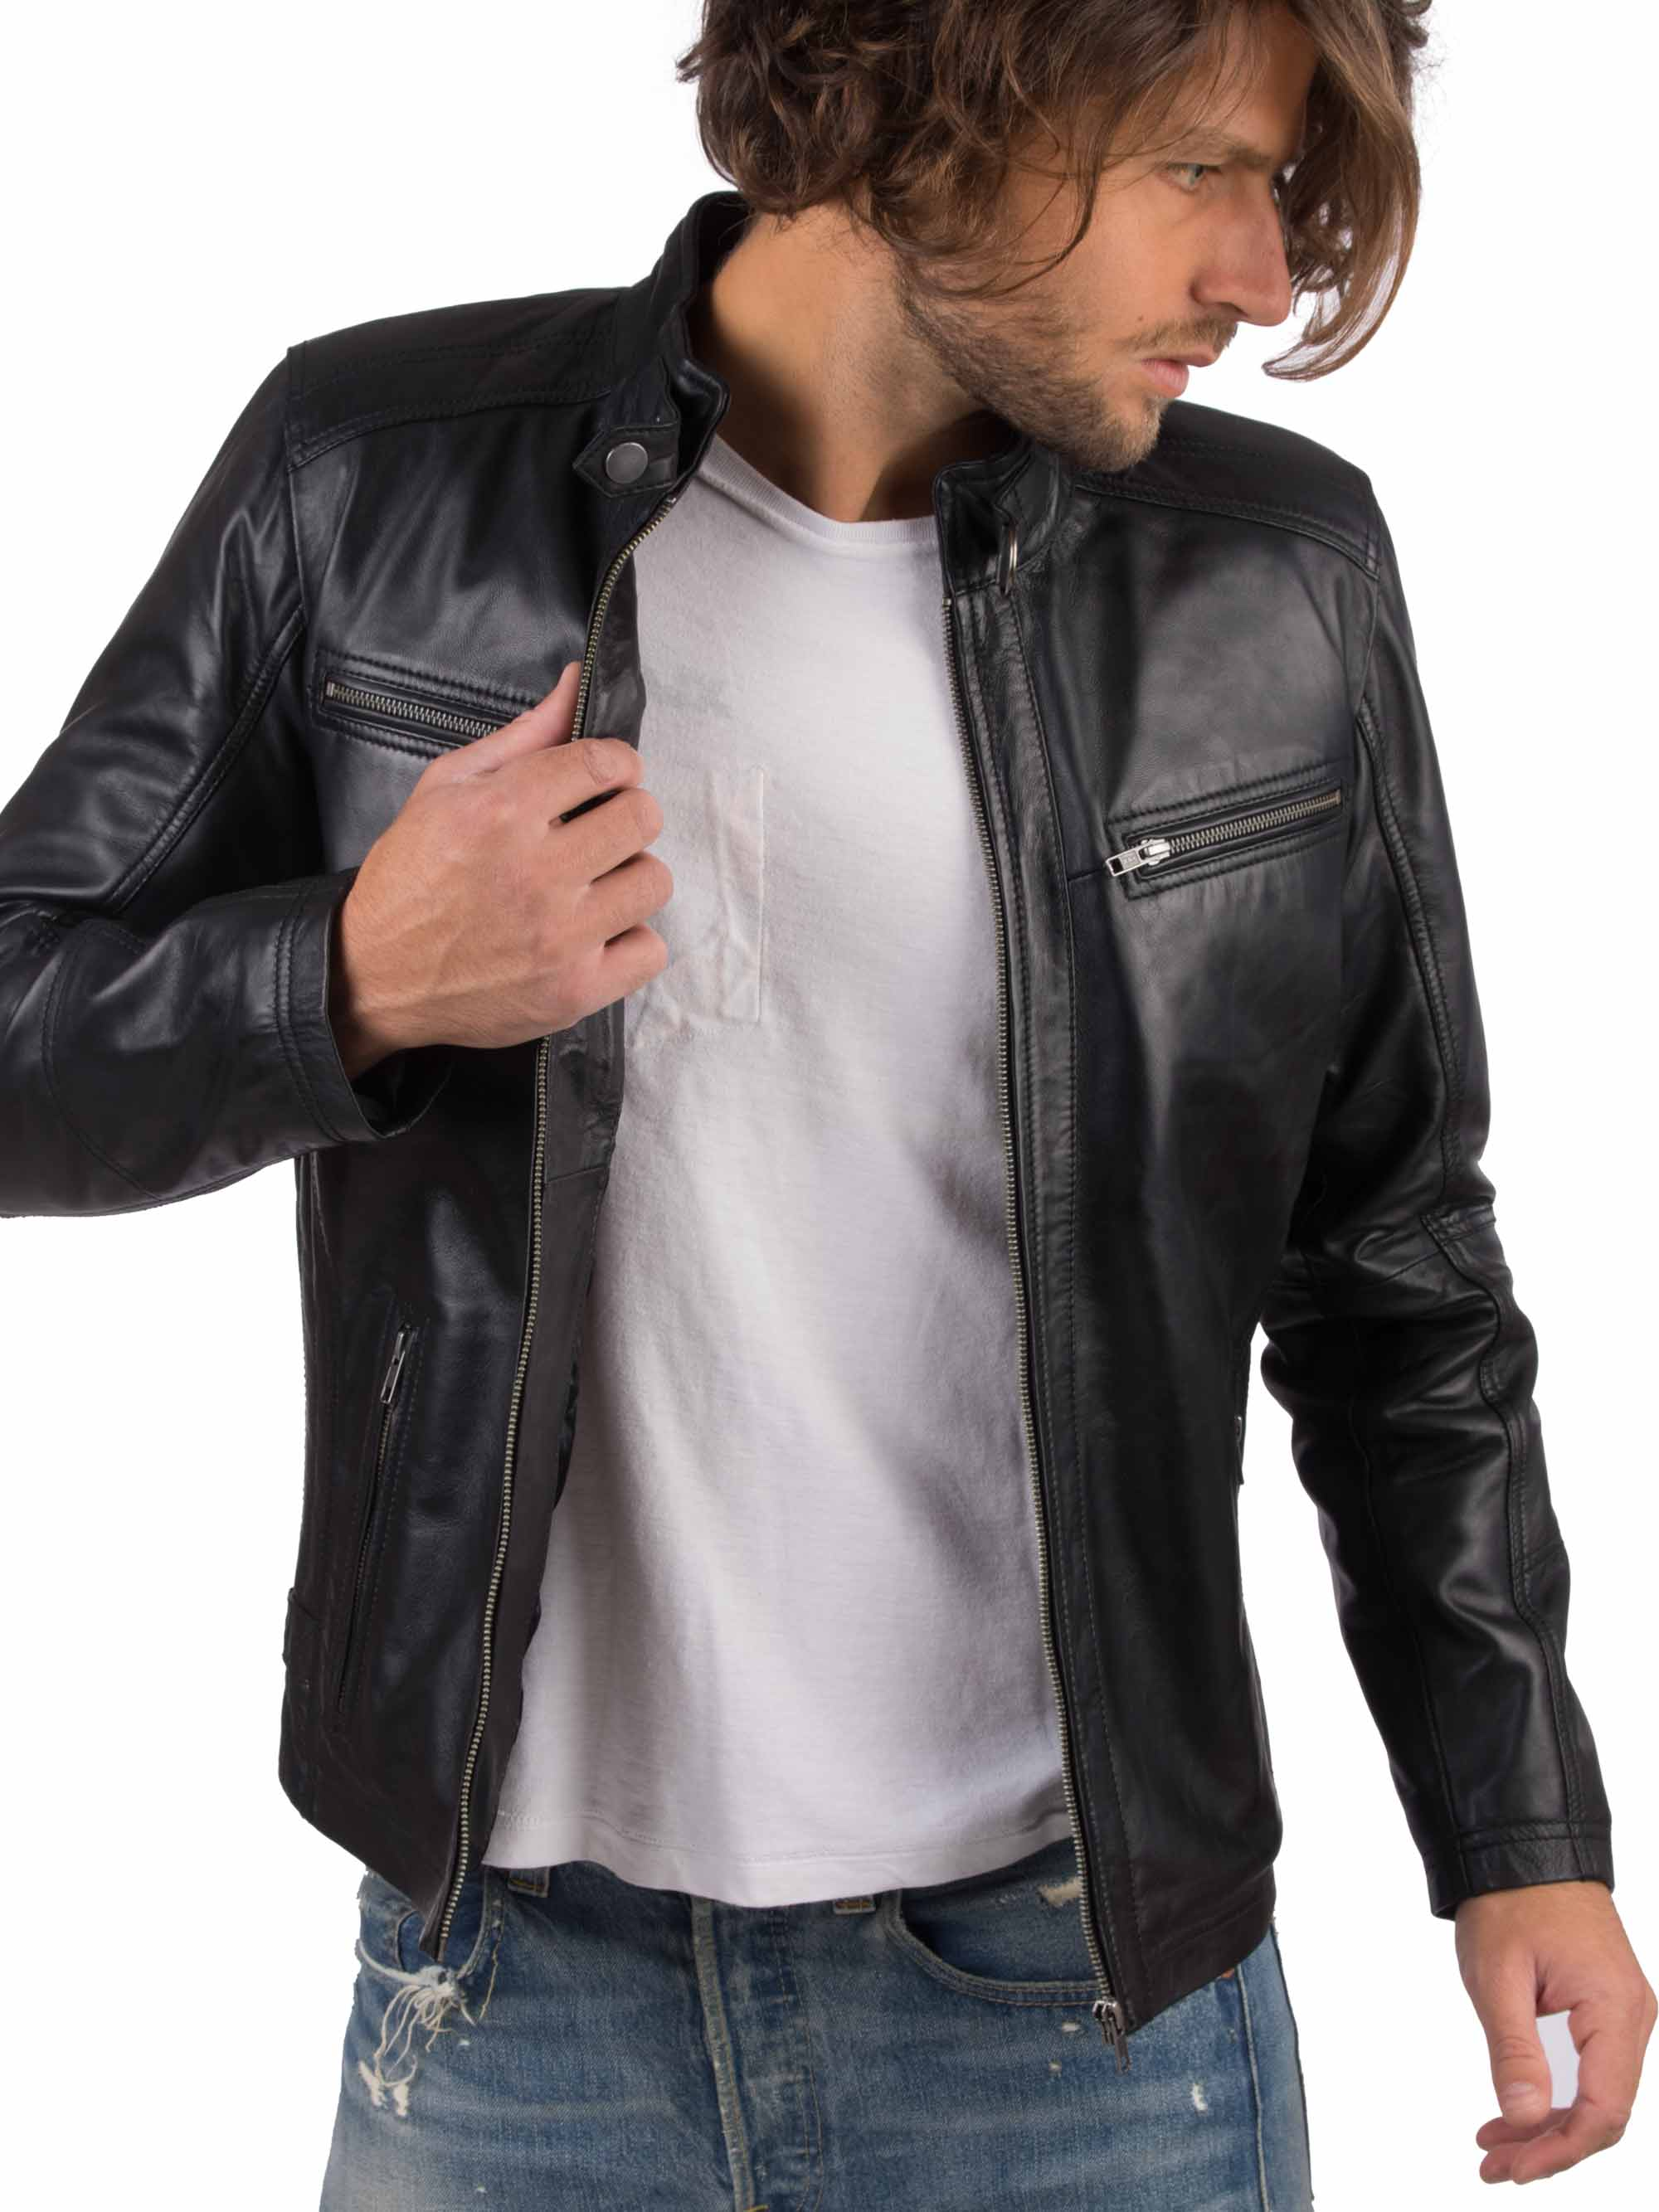 Hc77be2ec032e4205938a61d38d1086186 VAINAS European Brand Mens Genuine Leather jacket for men Winter Real sheep leather jacket Motorcycle jackets Biker jackets Alfa